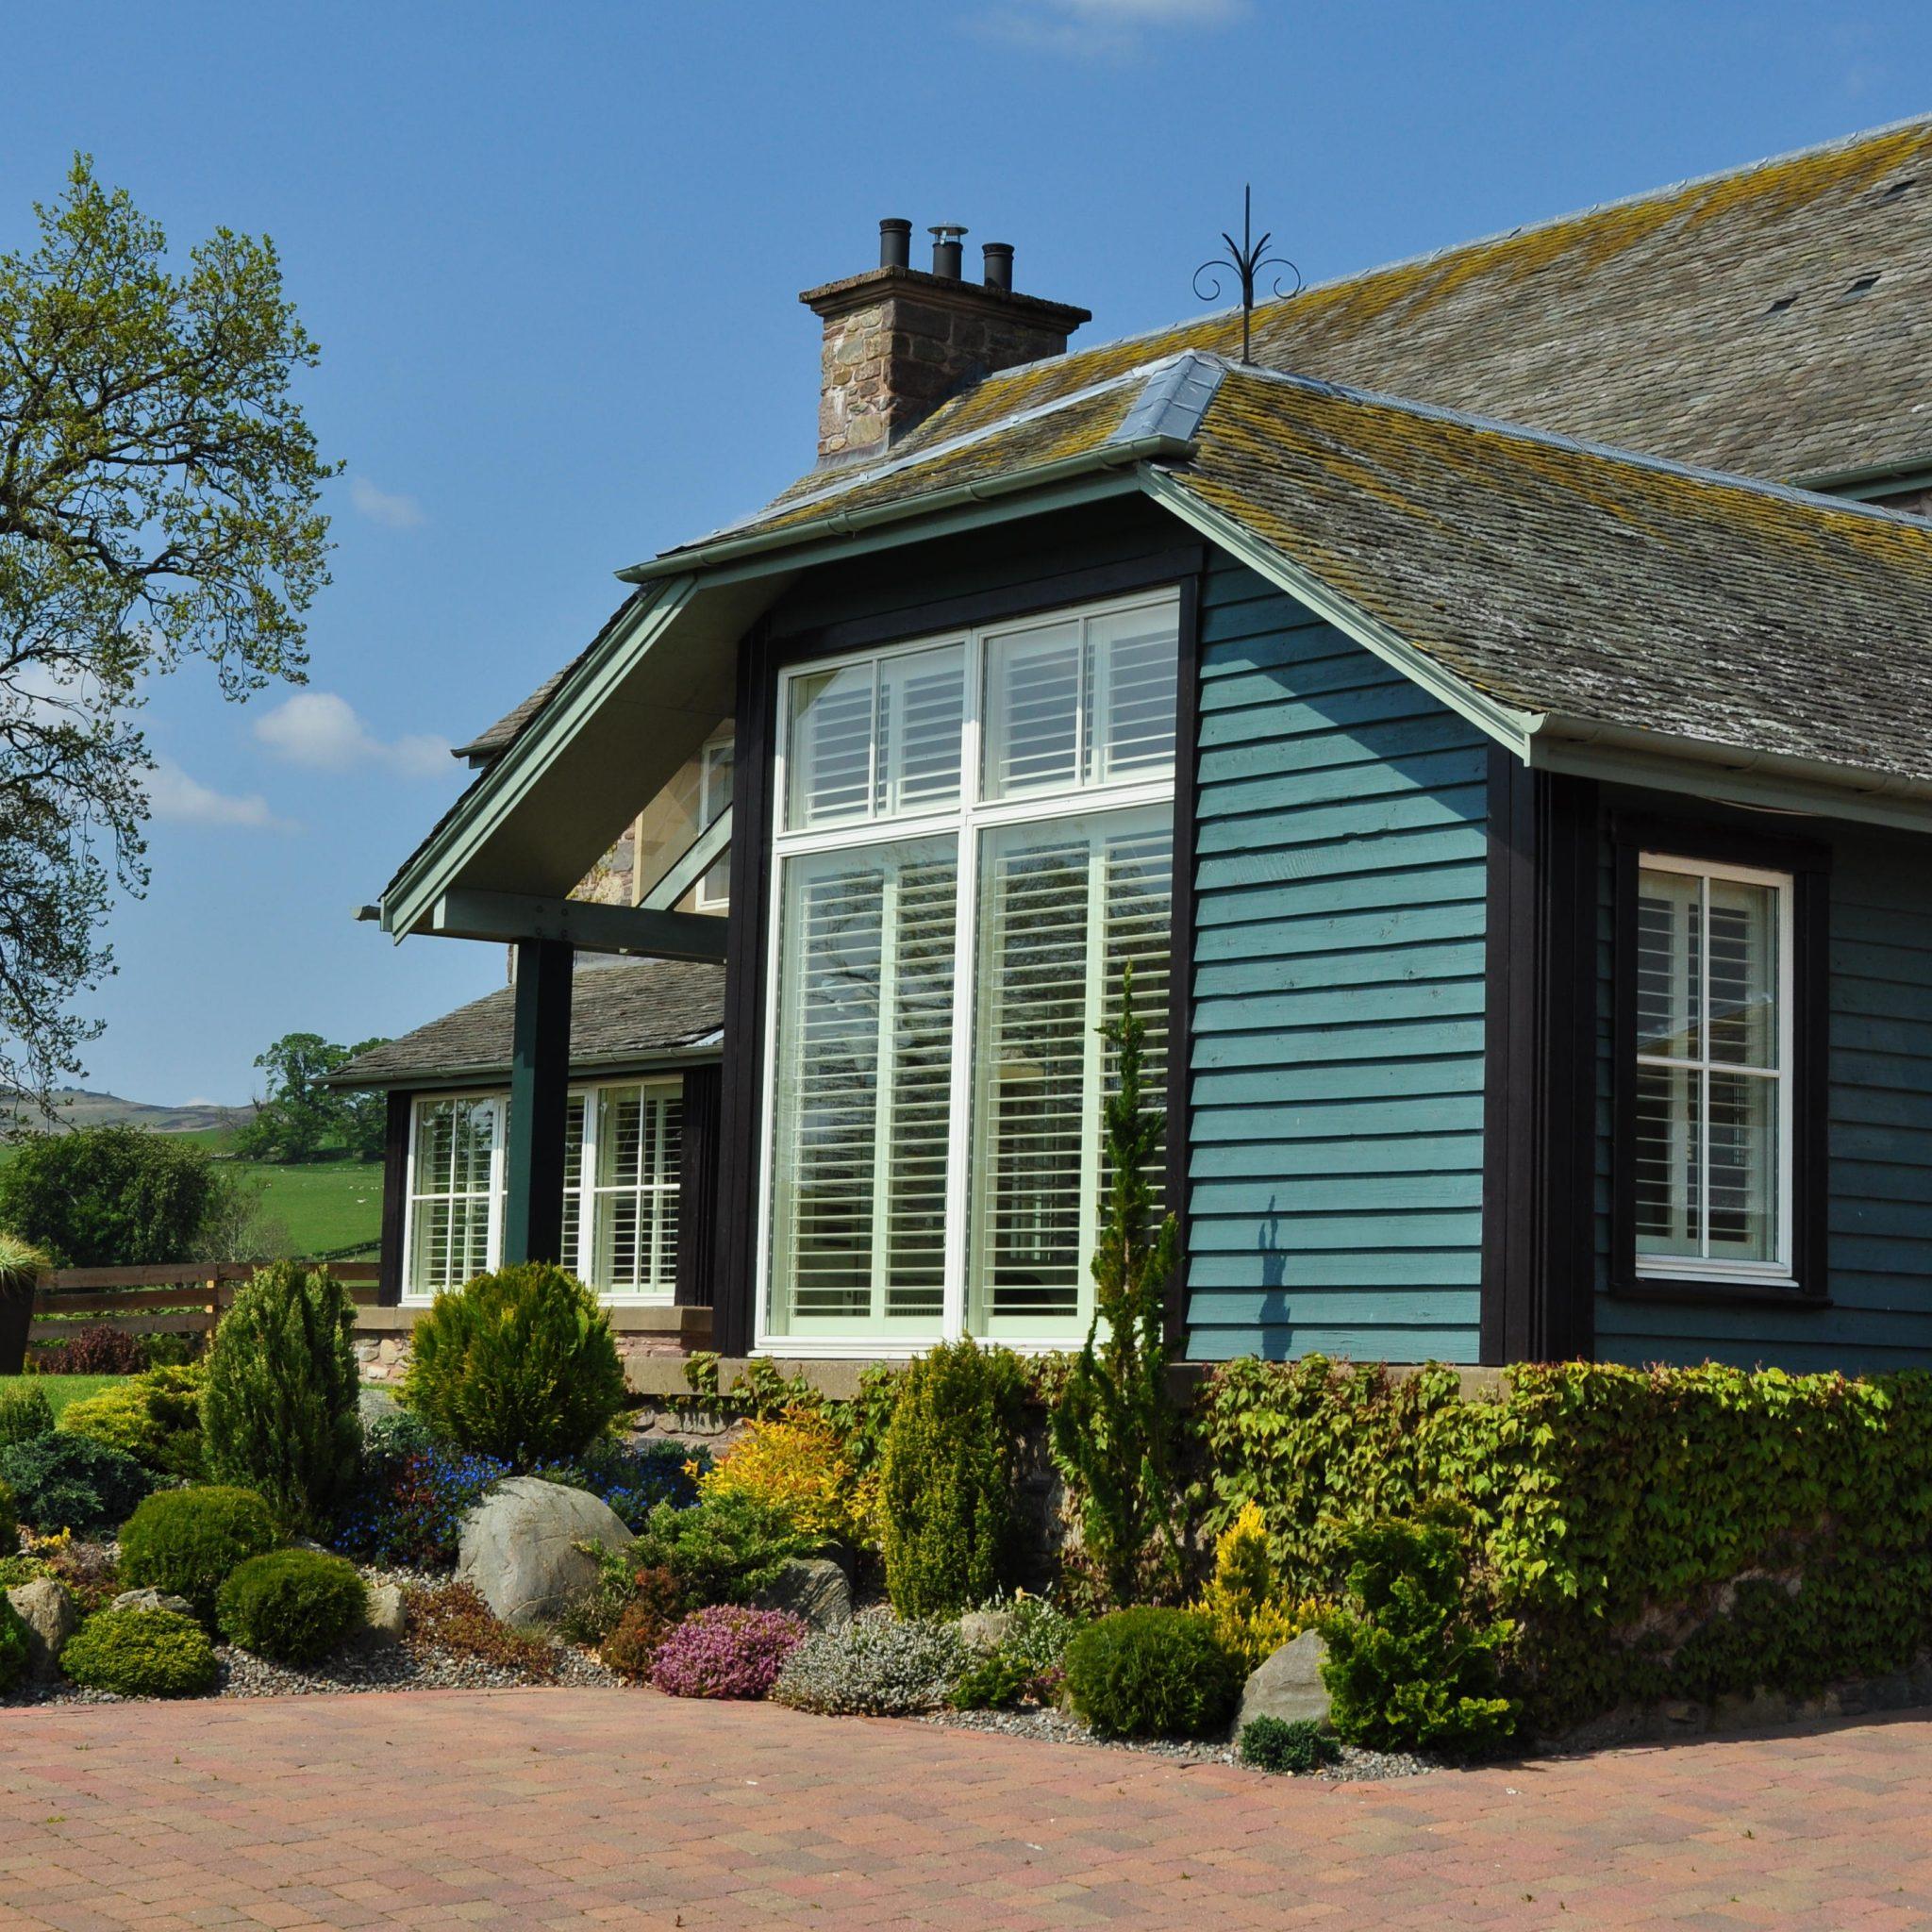 Craigdarroch House